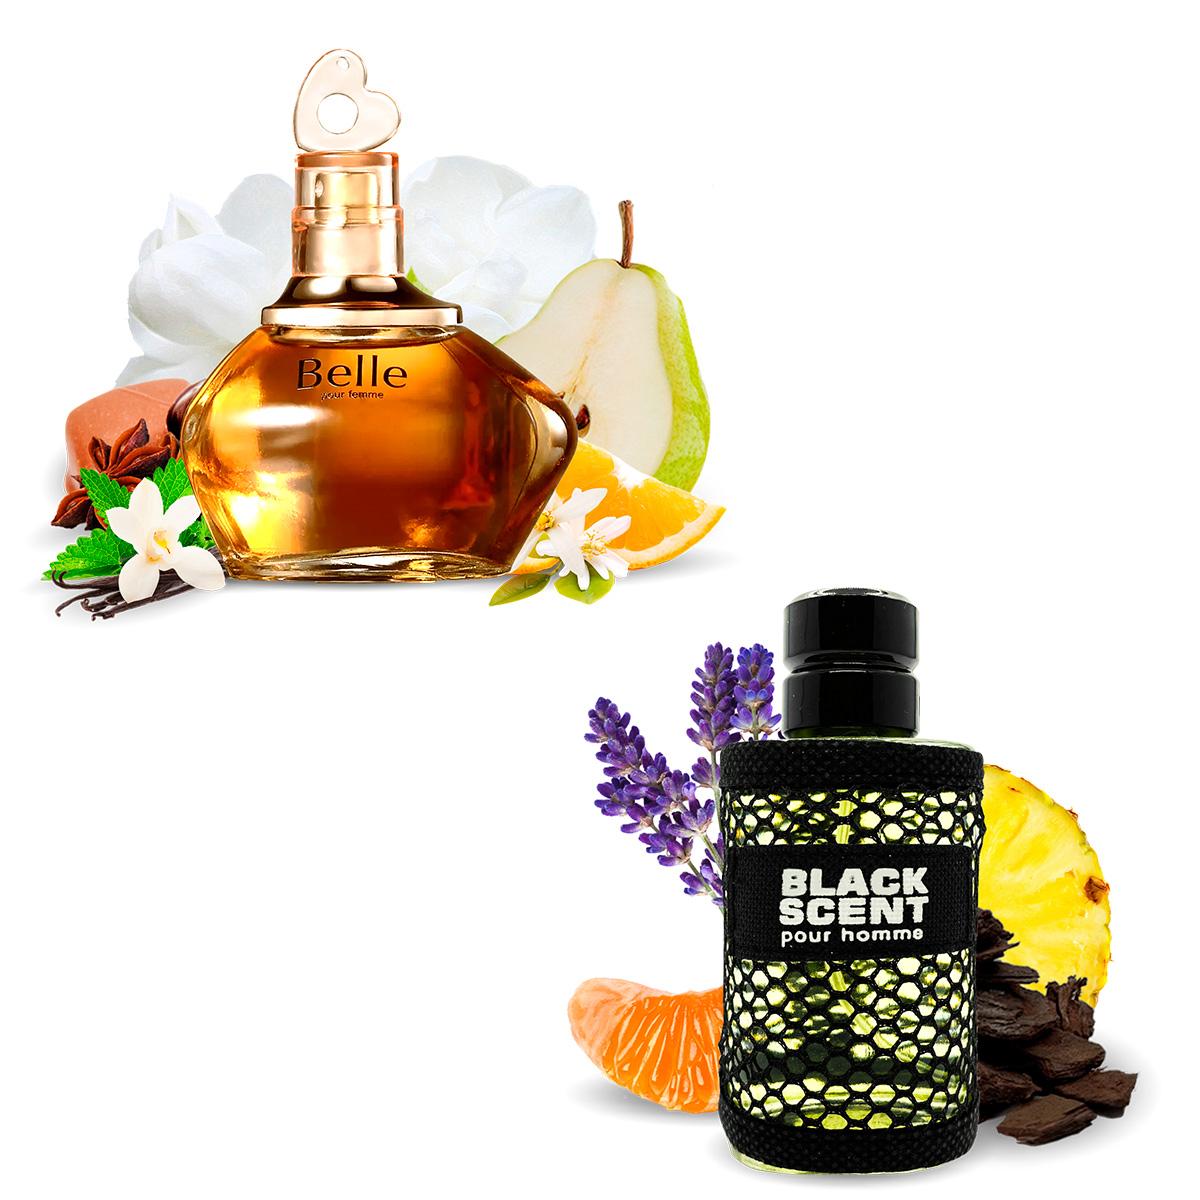 Kit 2 Perfumes Importados Belle e Black Scent I Scents